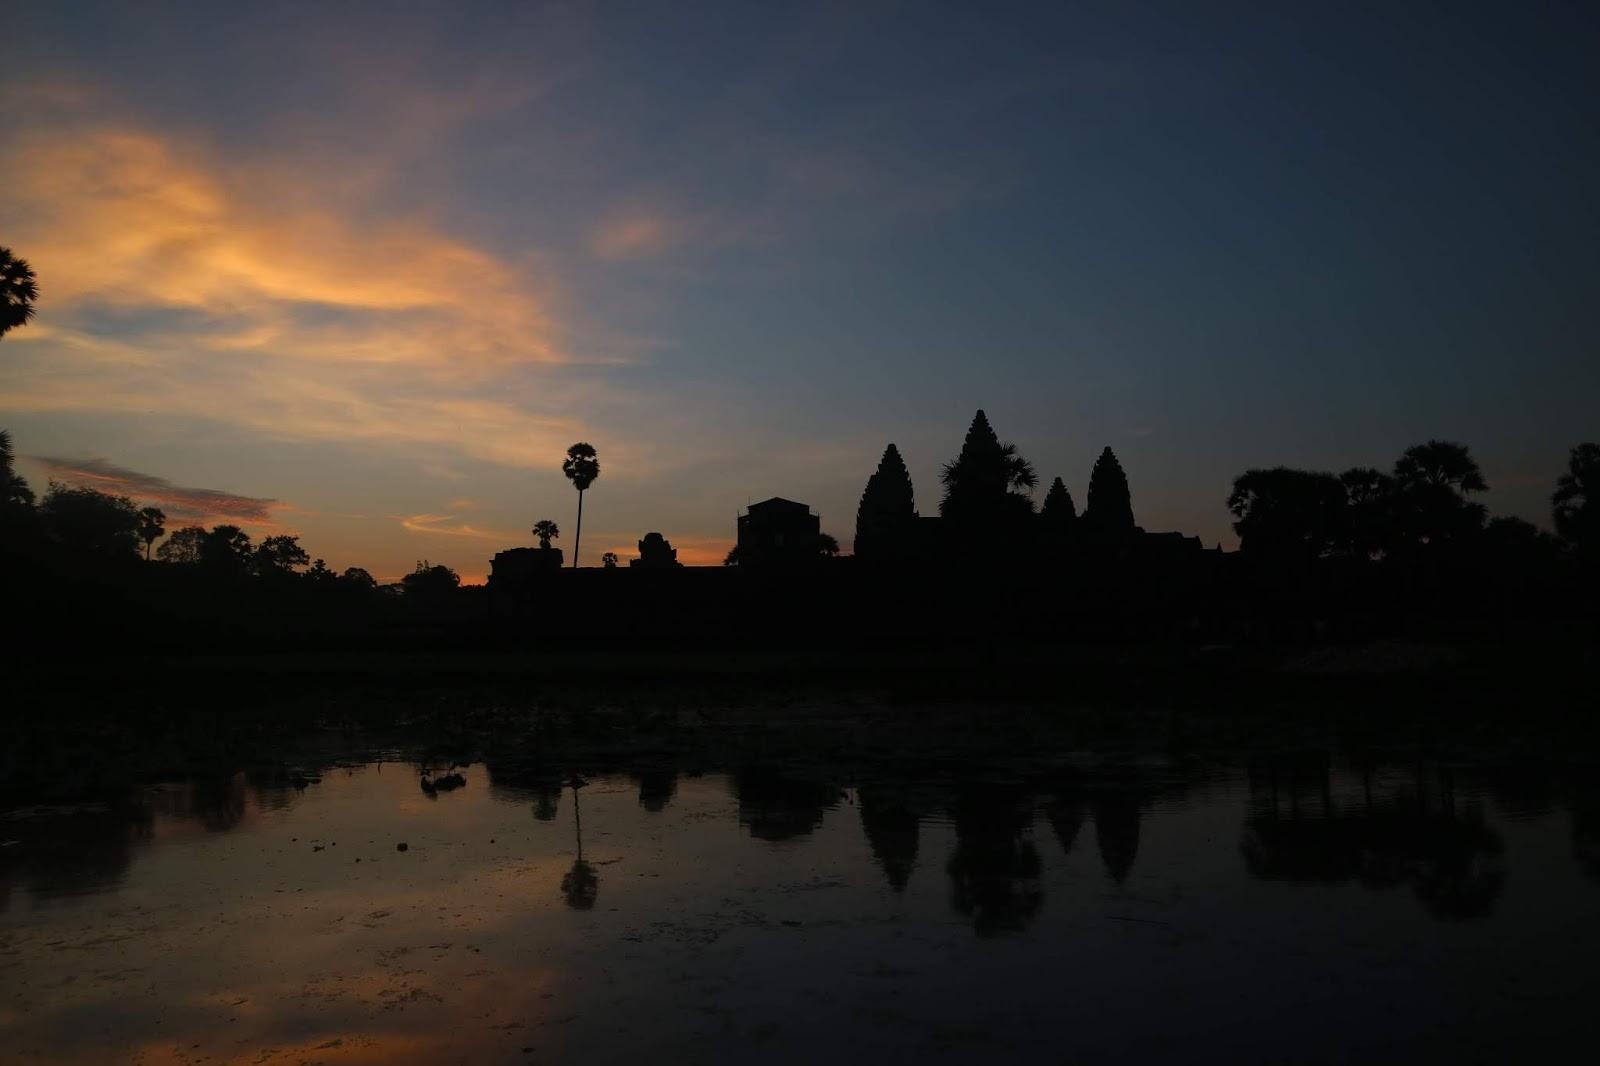 Facade of Angkor Wat in Sunrise